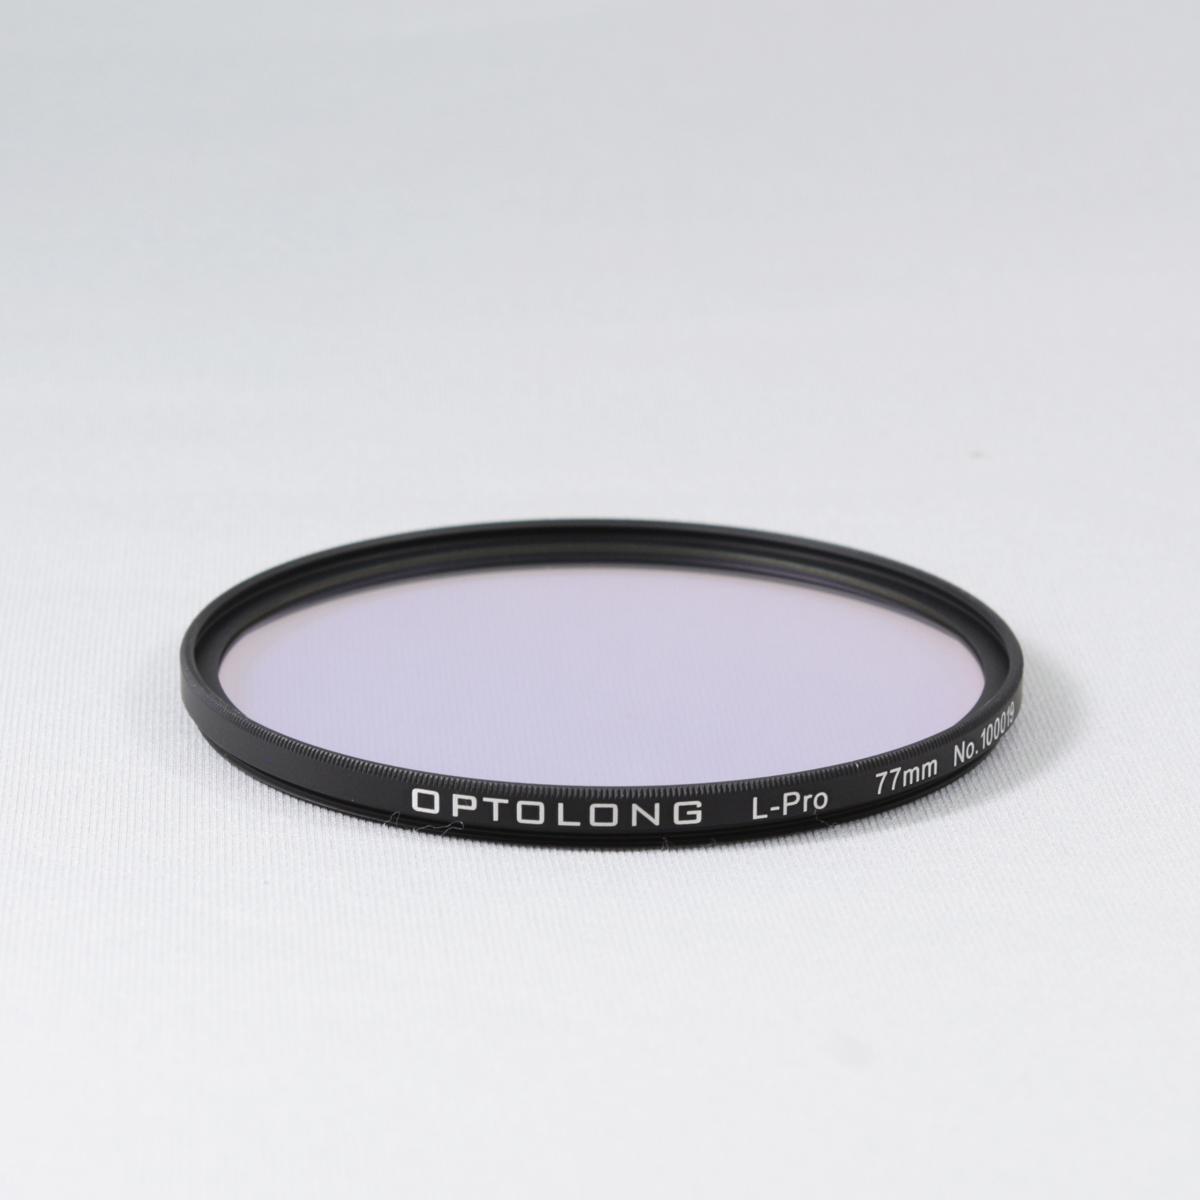 OPTOLONG オプトロン L-Pro 77mm 【フロント装着タイプ】